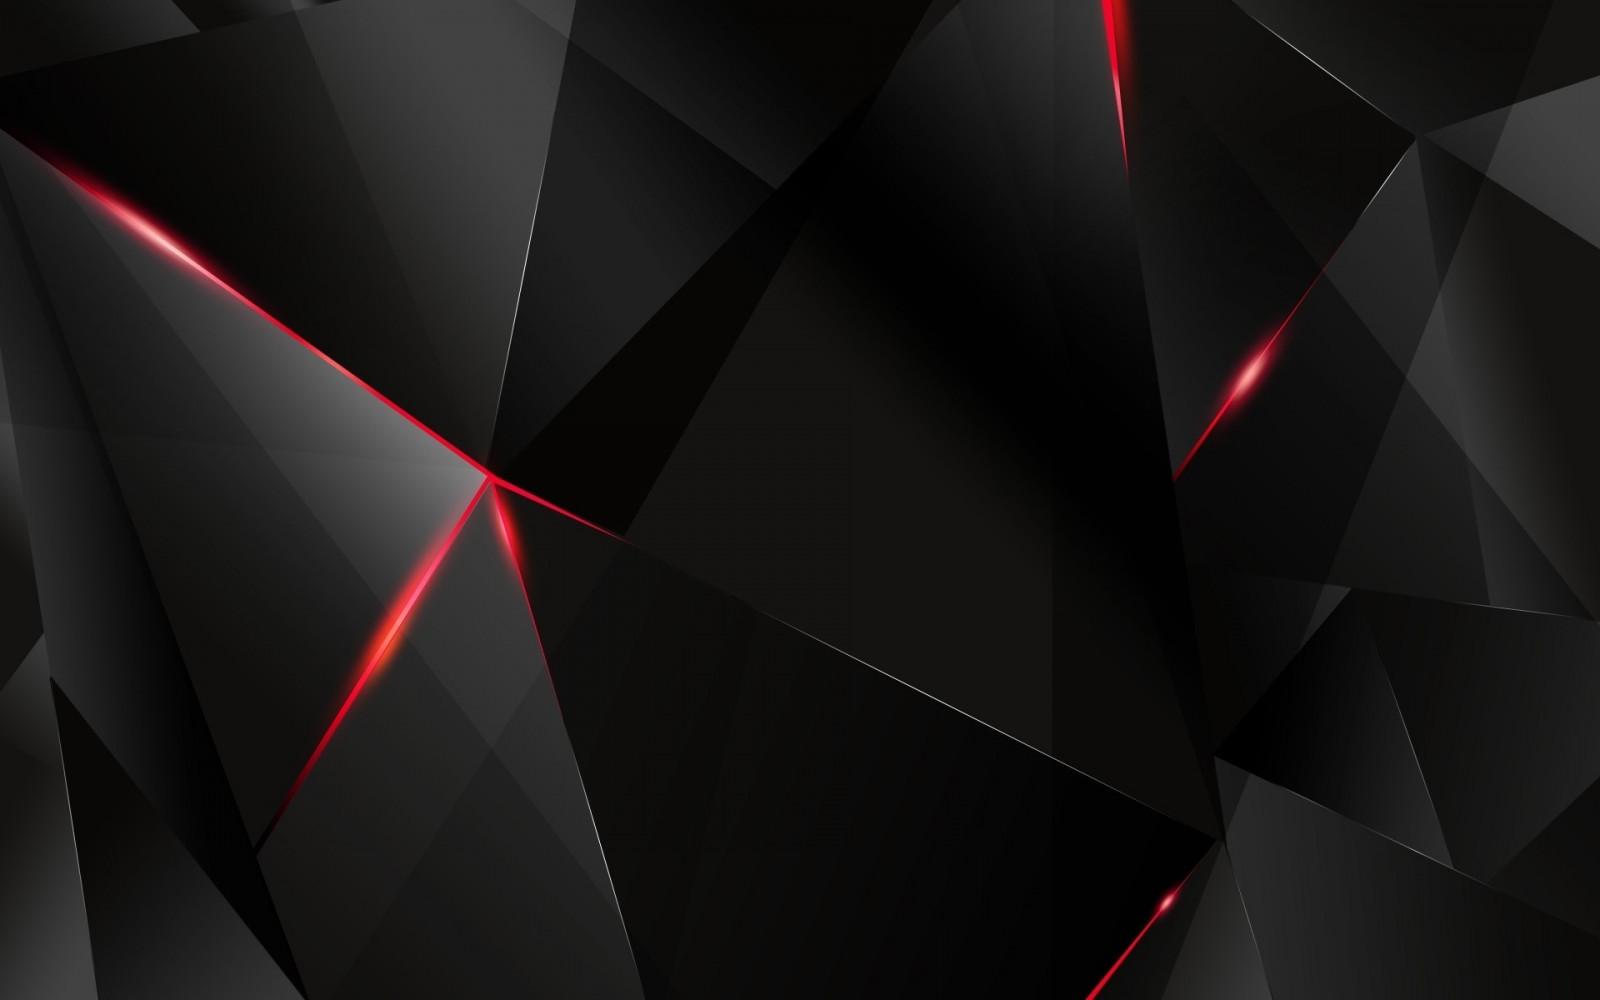 wallpapers download black -#main